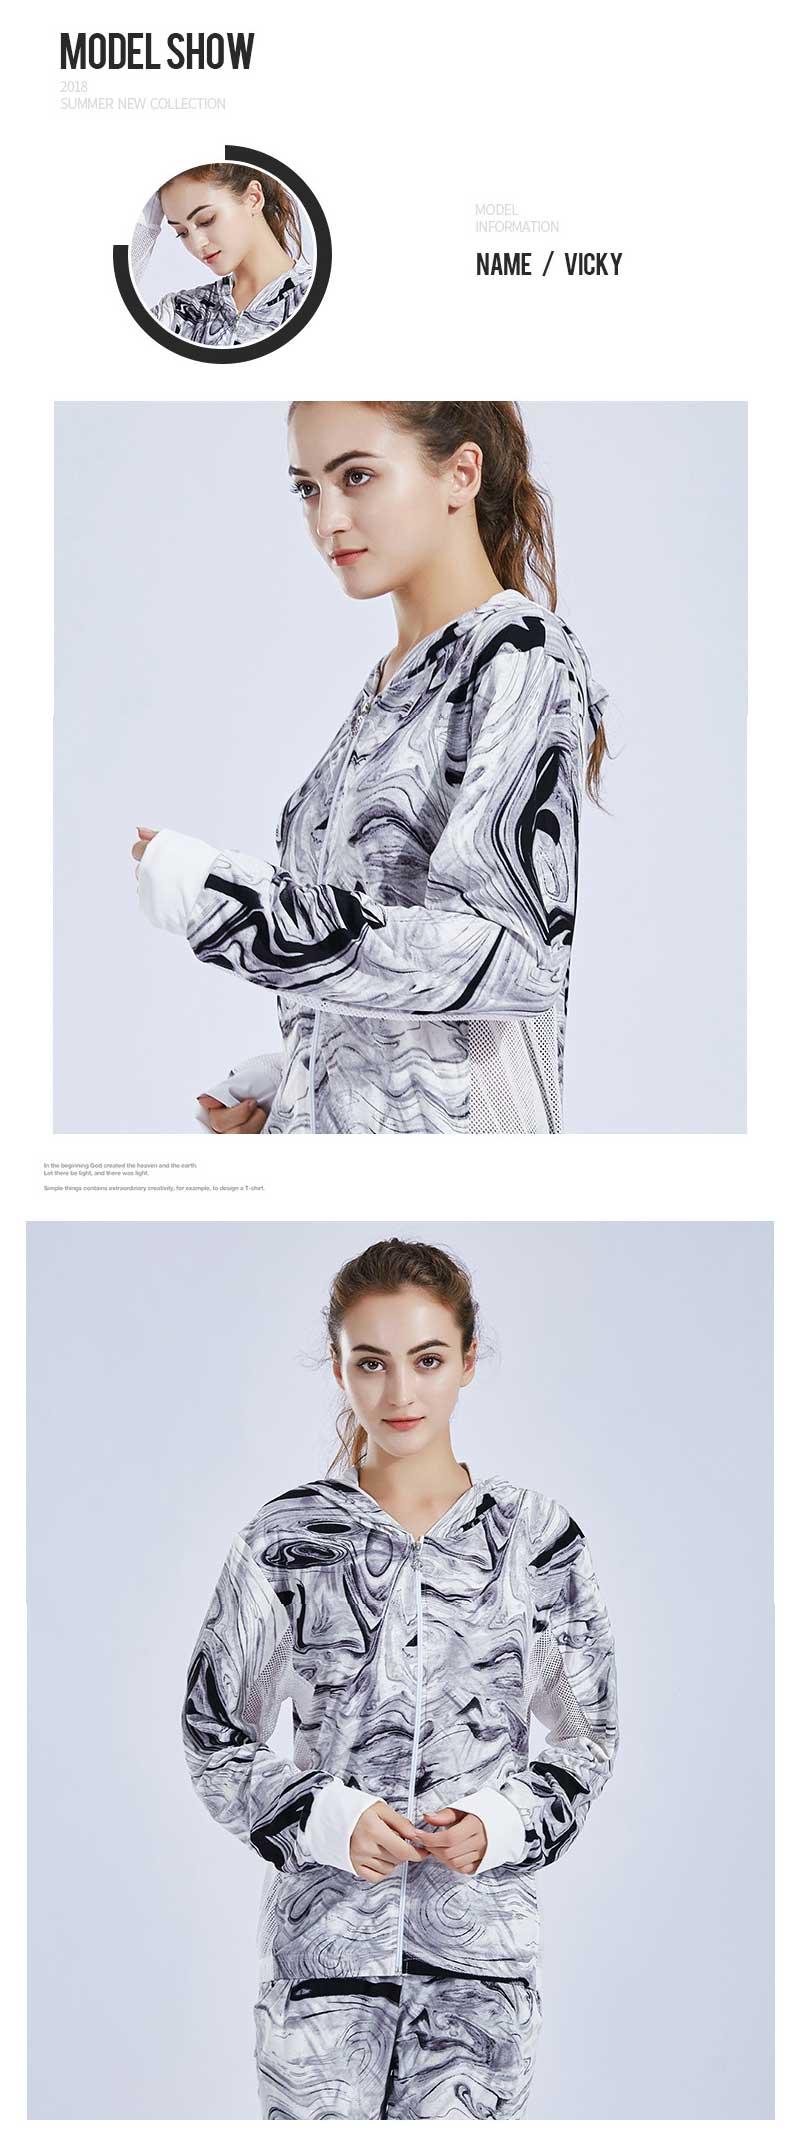 Custom-print-hoodies-model-show